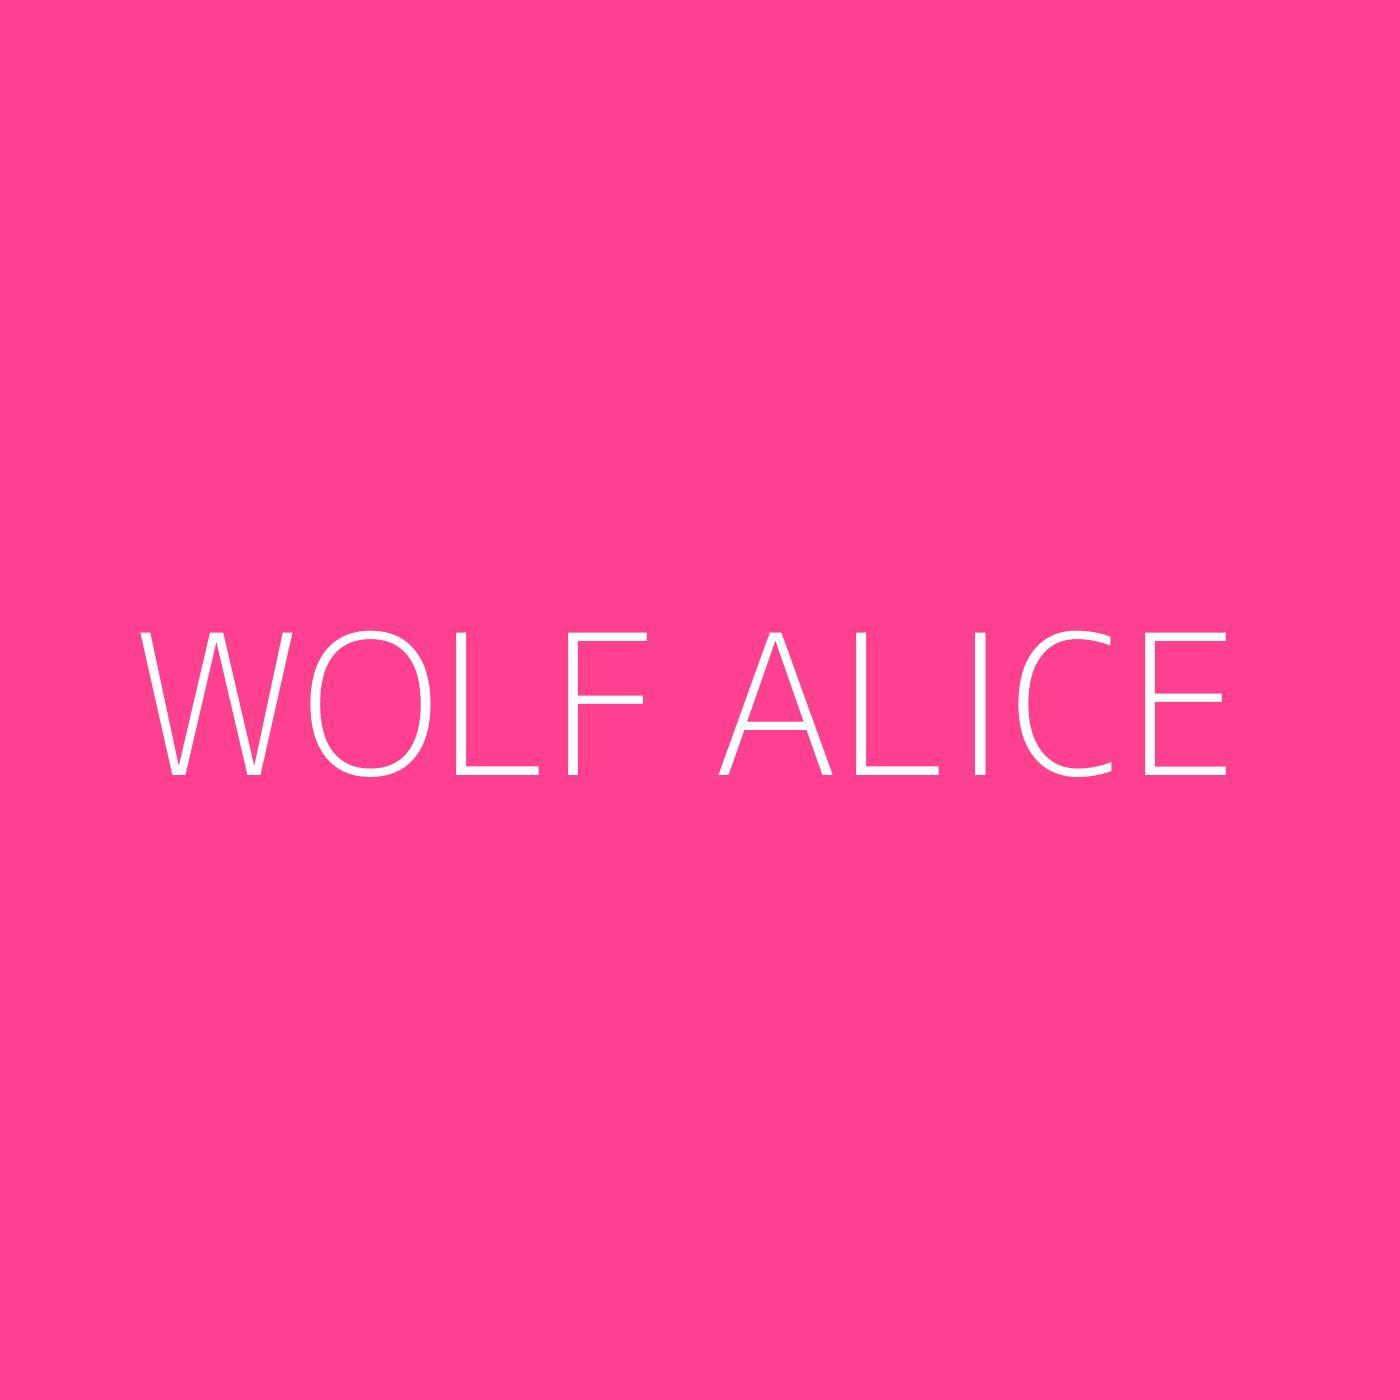 Wolf Alice Playlist Artwork